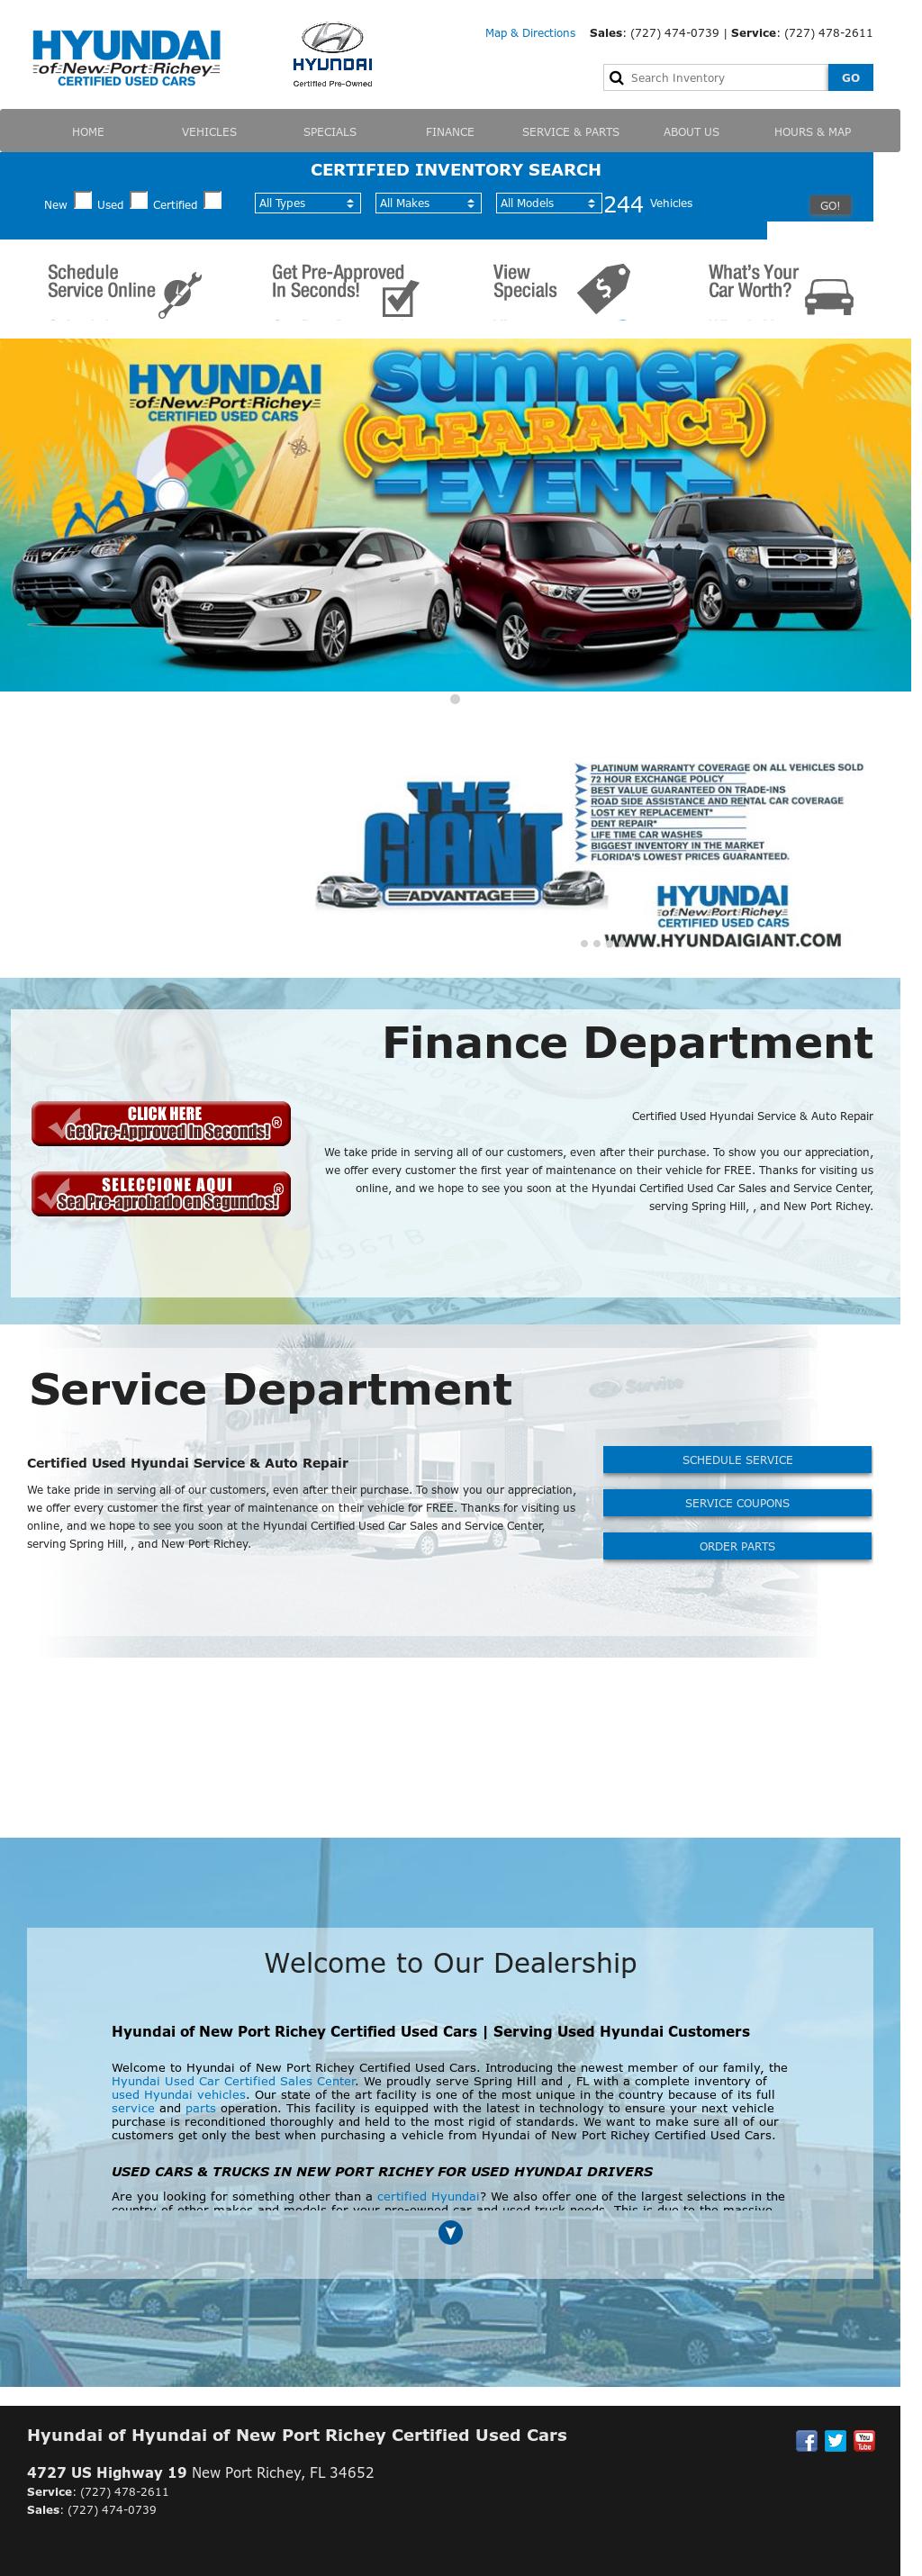 Hyundai New Port Richey petitors Revenue and Employees